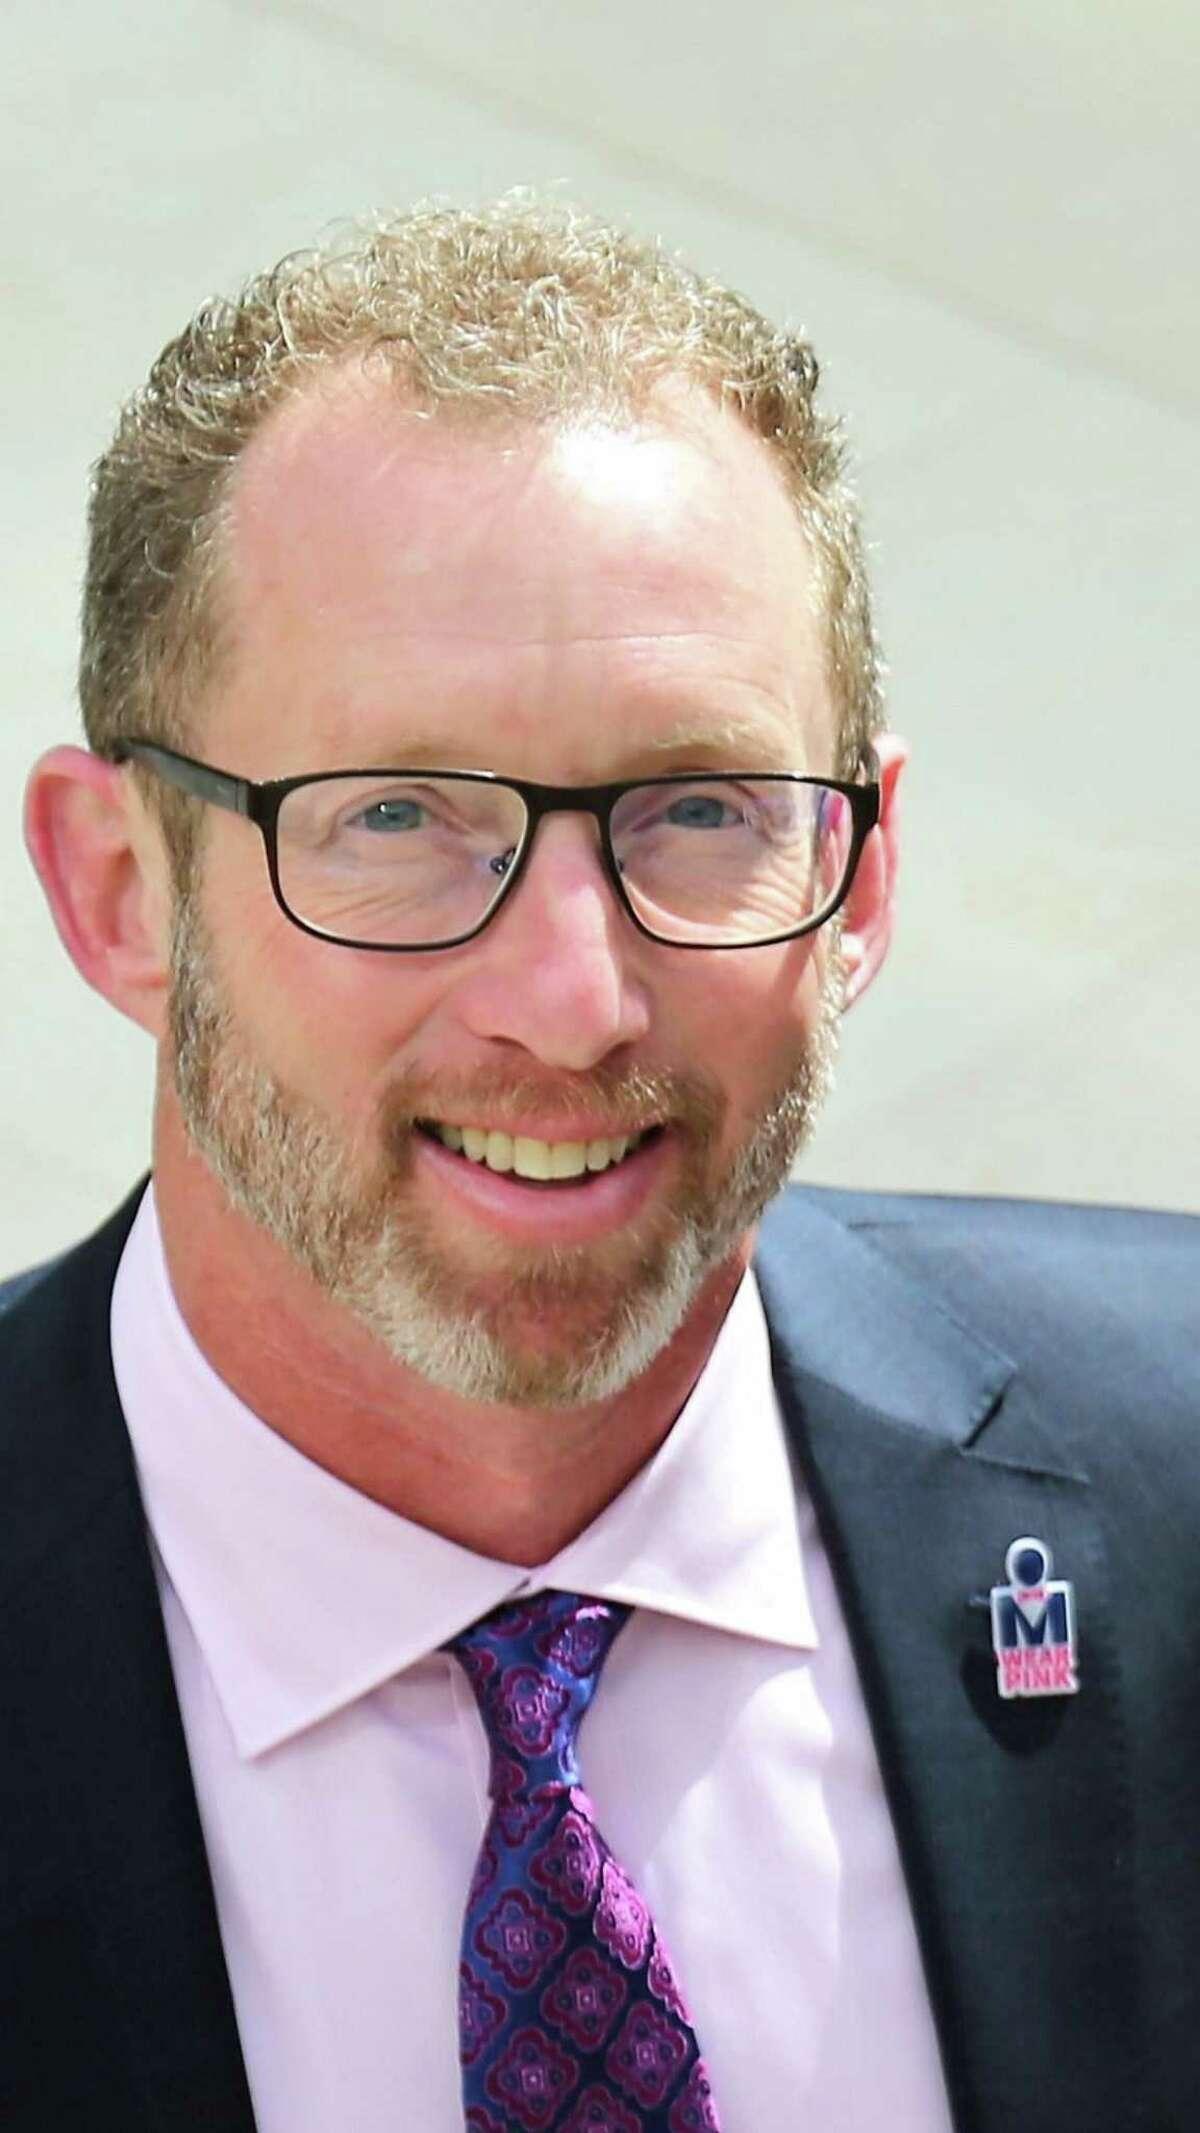 Purdue Pharma CEO and President Craig Landau